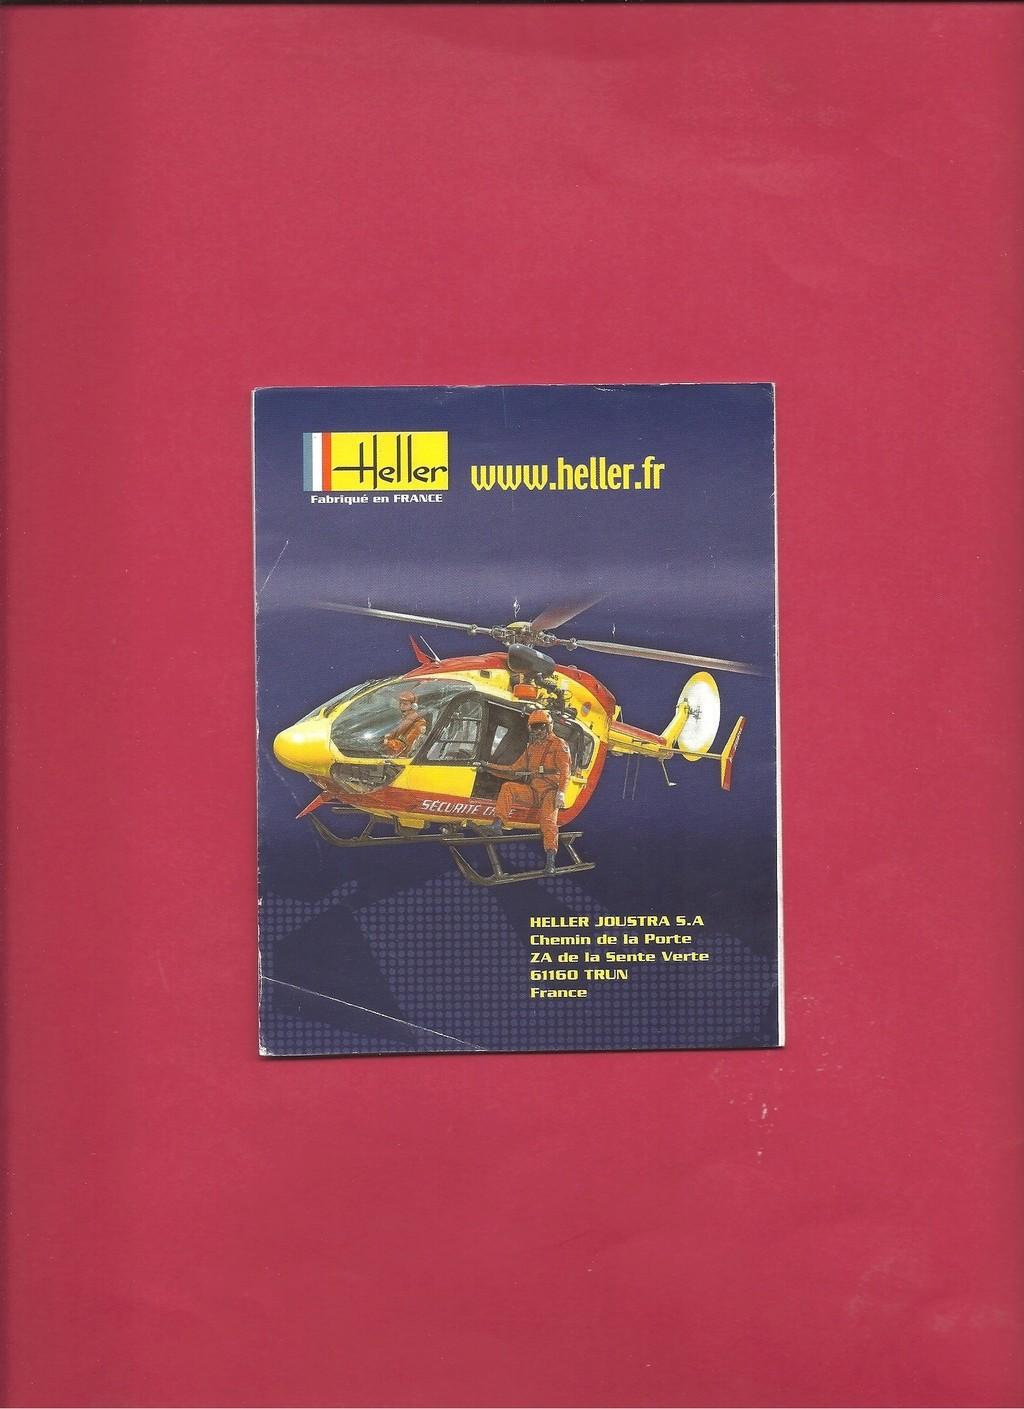 [2011] Mini cataloguet 2011 Hell1698